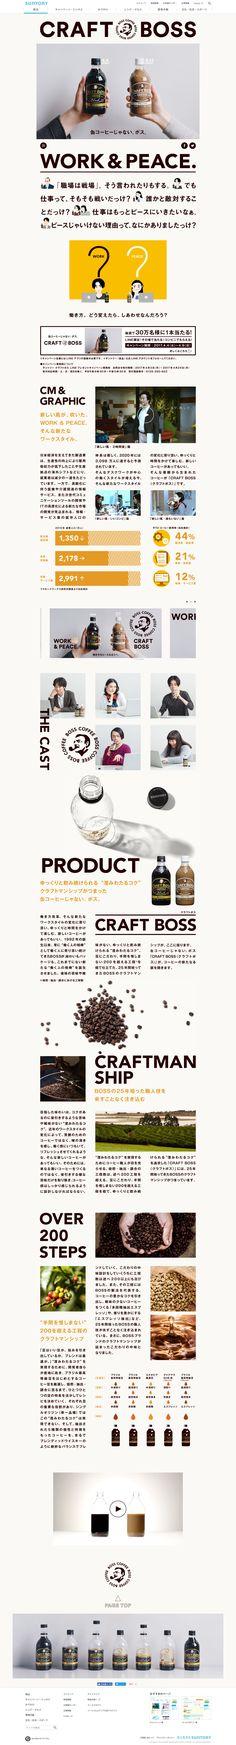 CRAFT BOSS(クラフトボス) サントリー http://www.suntory.co.jp/softdrink/craftboss/